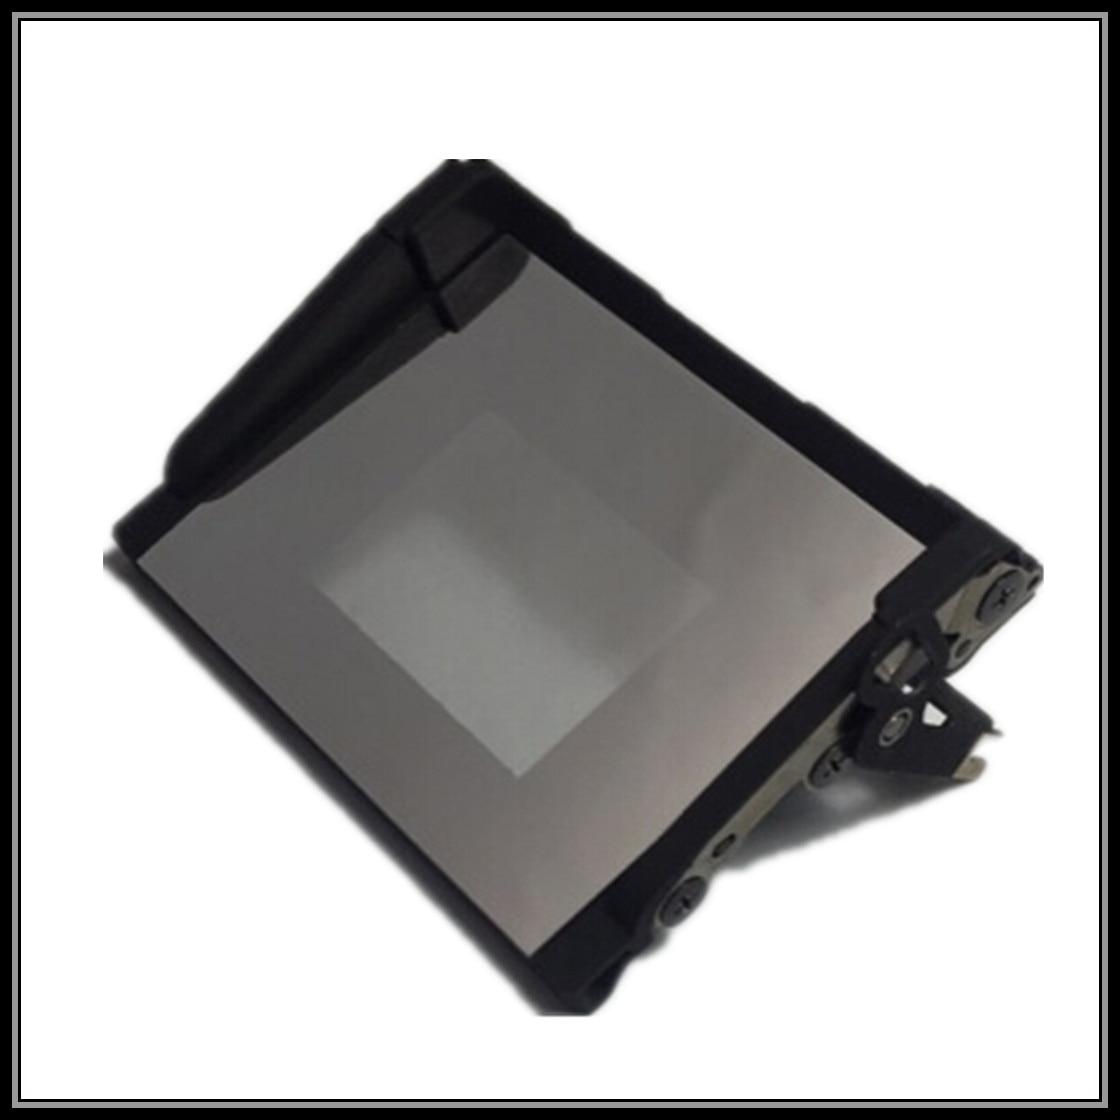 New Original For Nikon D800 D800e Reflective Mirror Box Reflector Imaging Products Parts And Controls Photos List